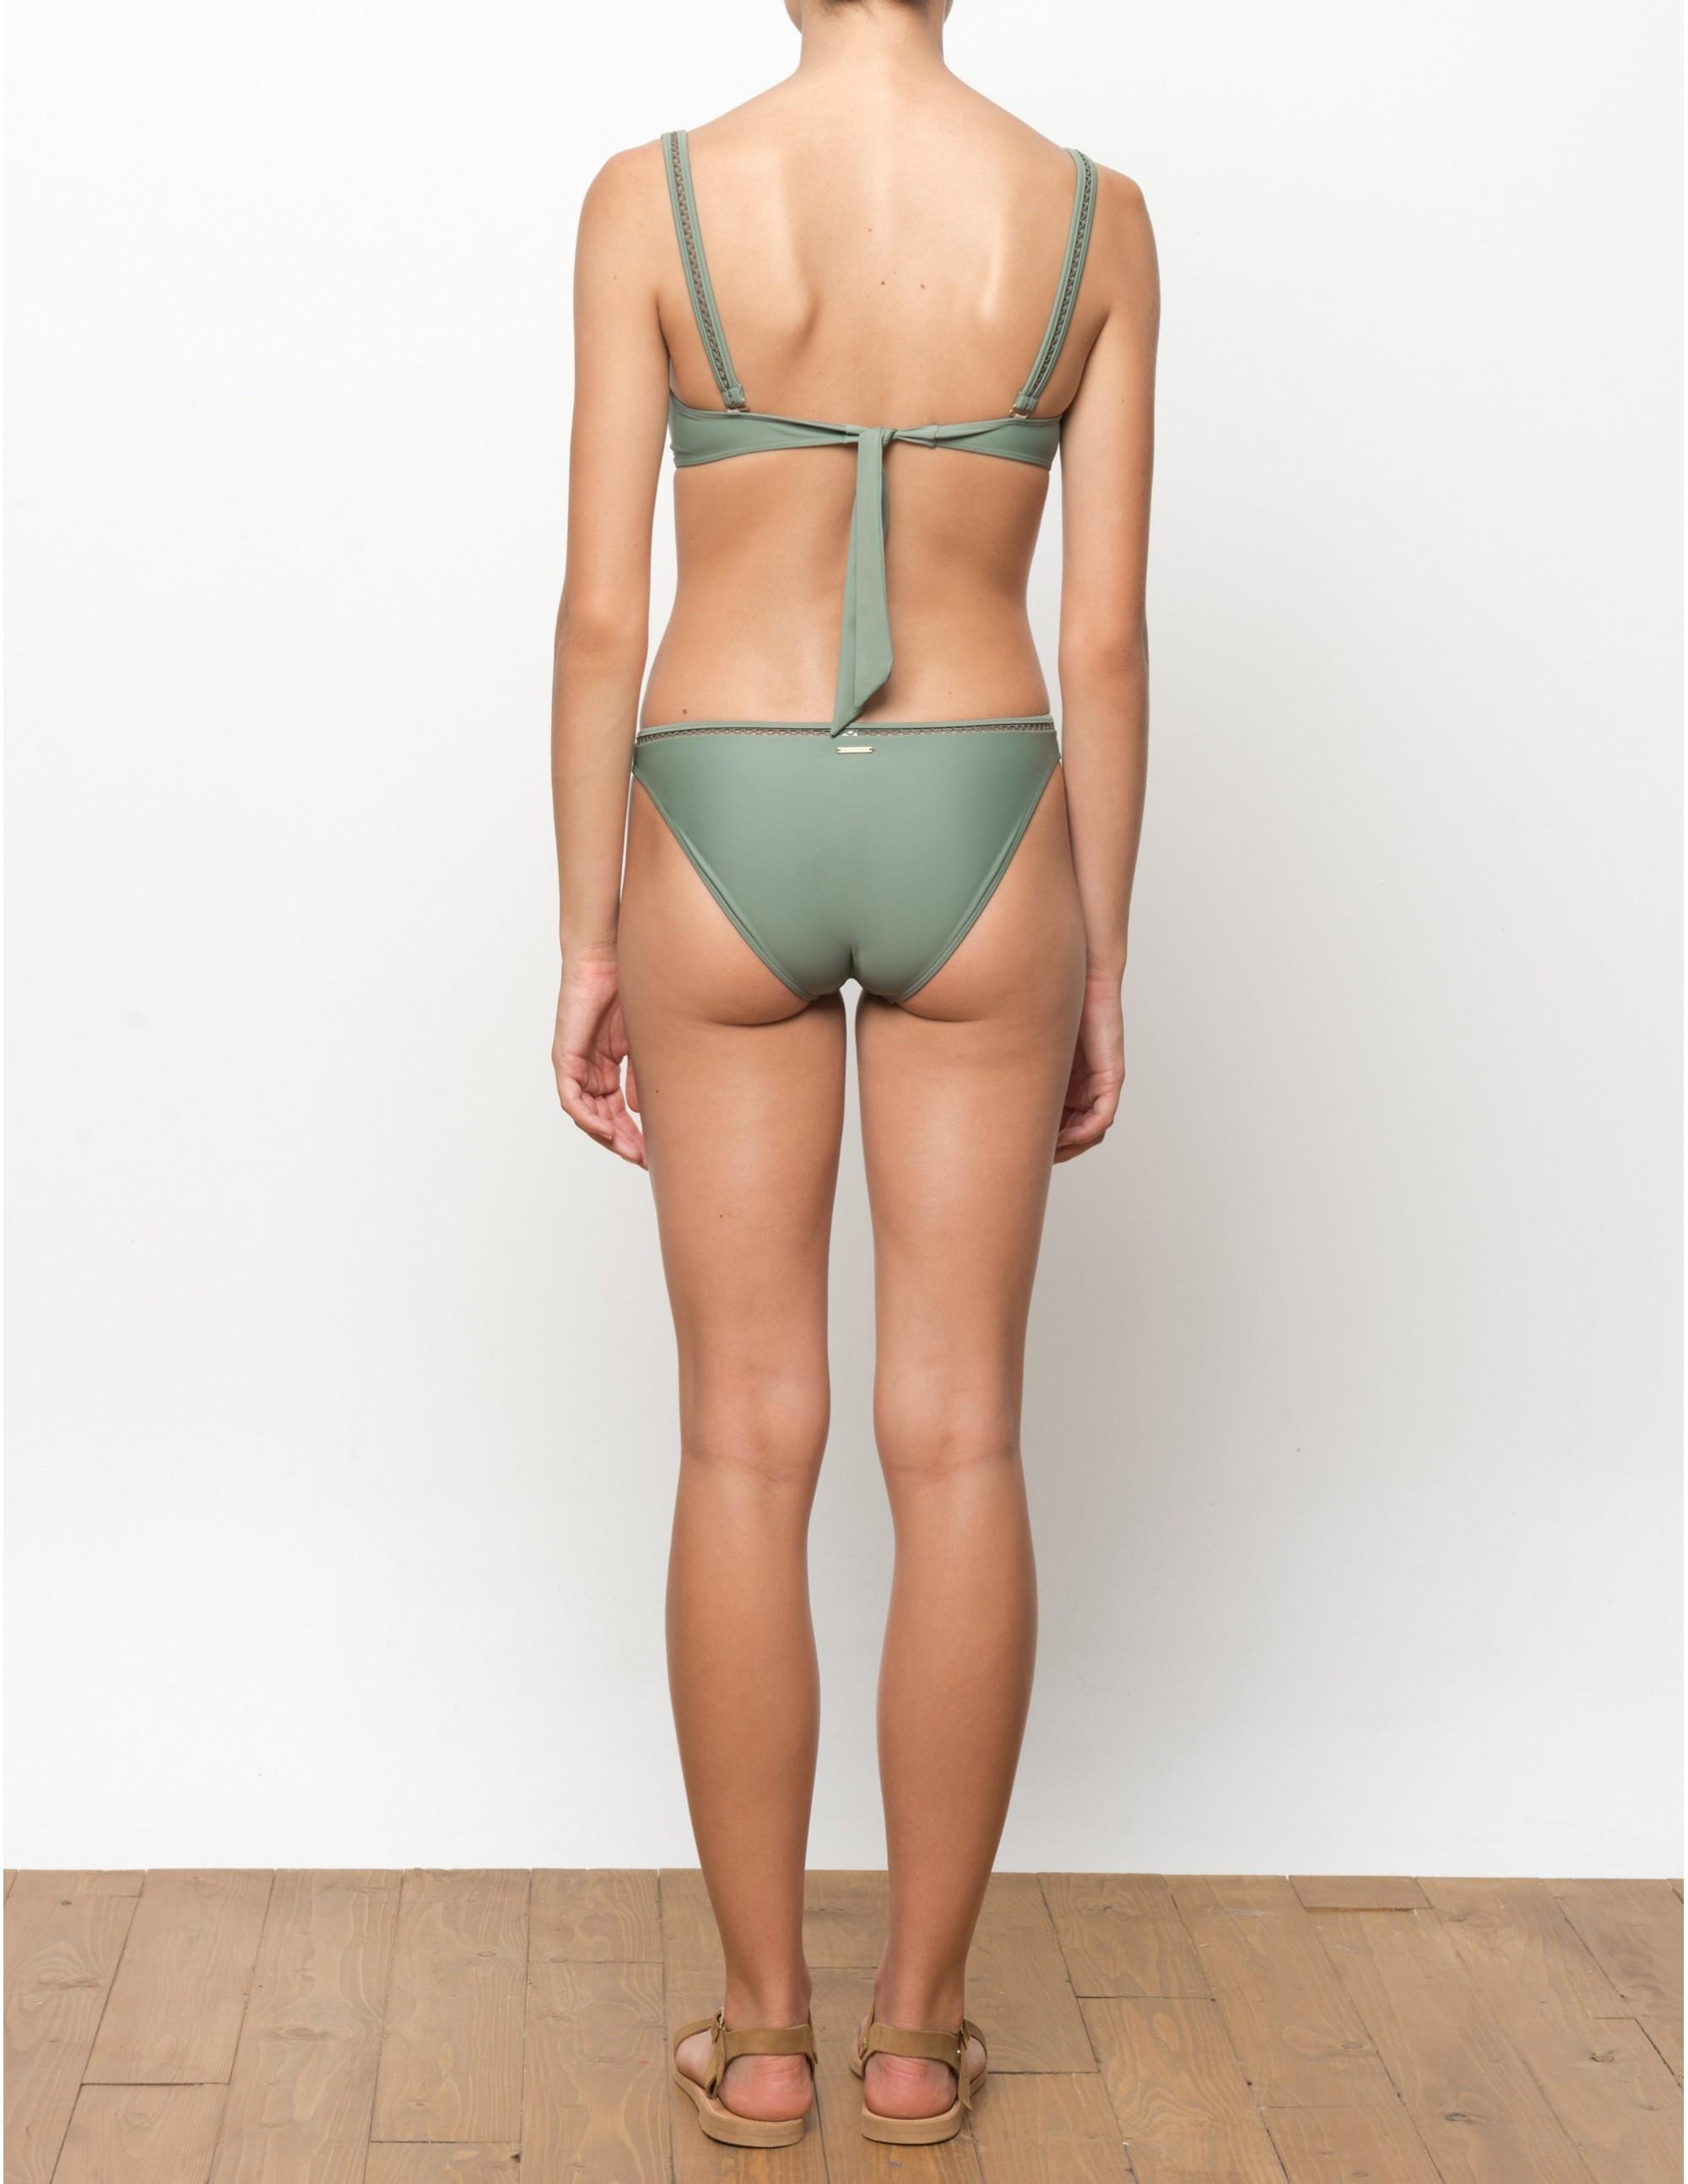 SIMOS bikini top - SERENGETI